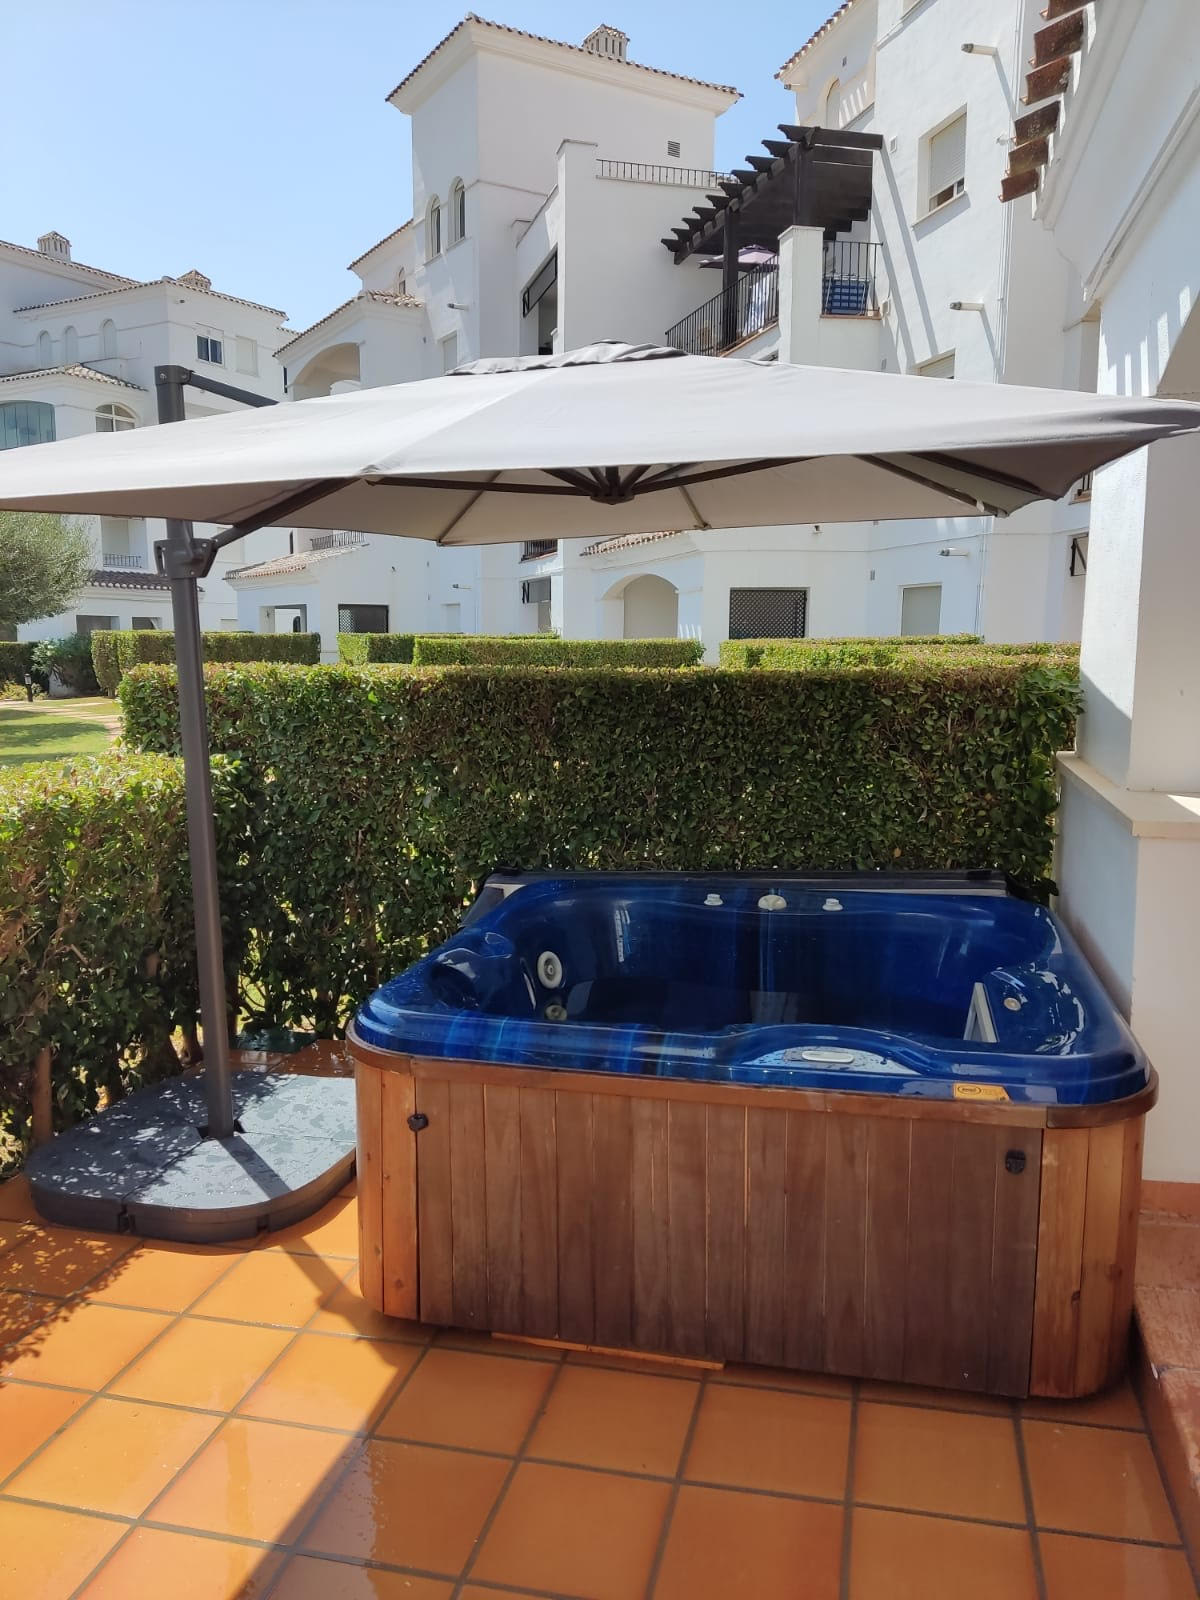 Casa Coco - Apartment Rental Spain (46)